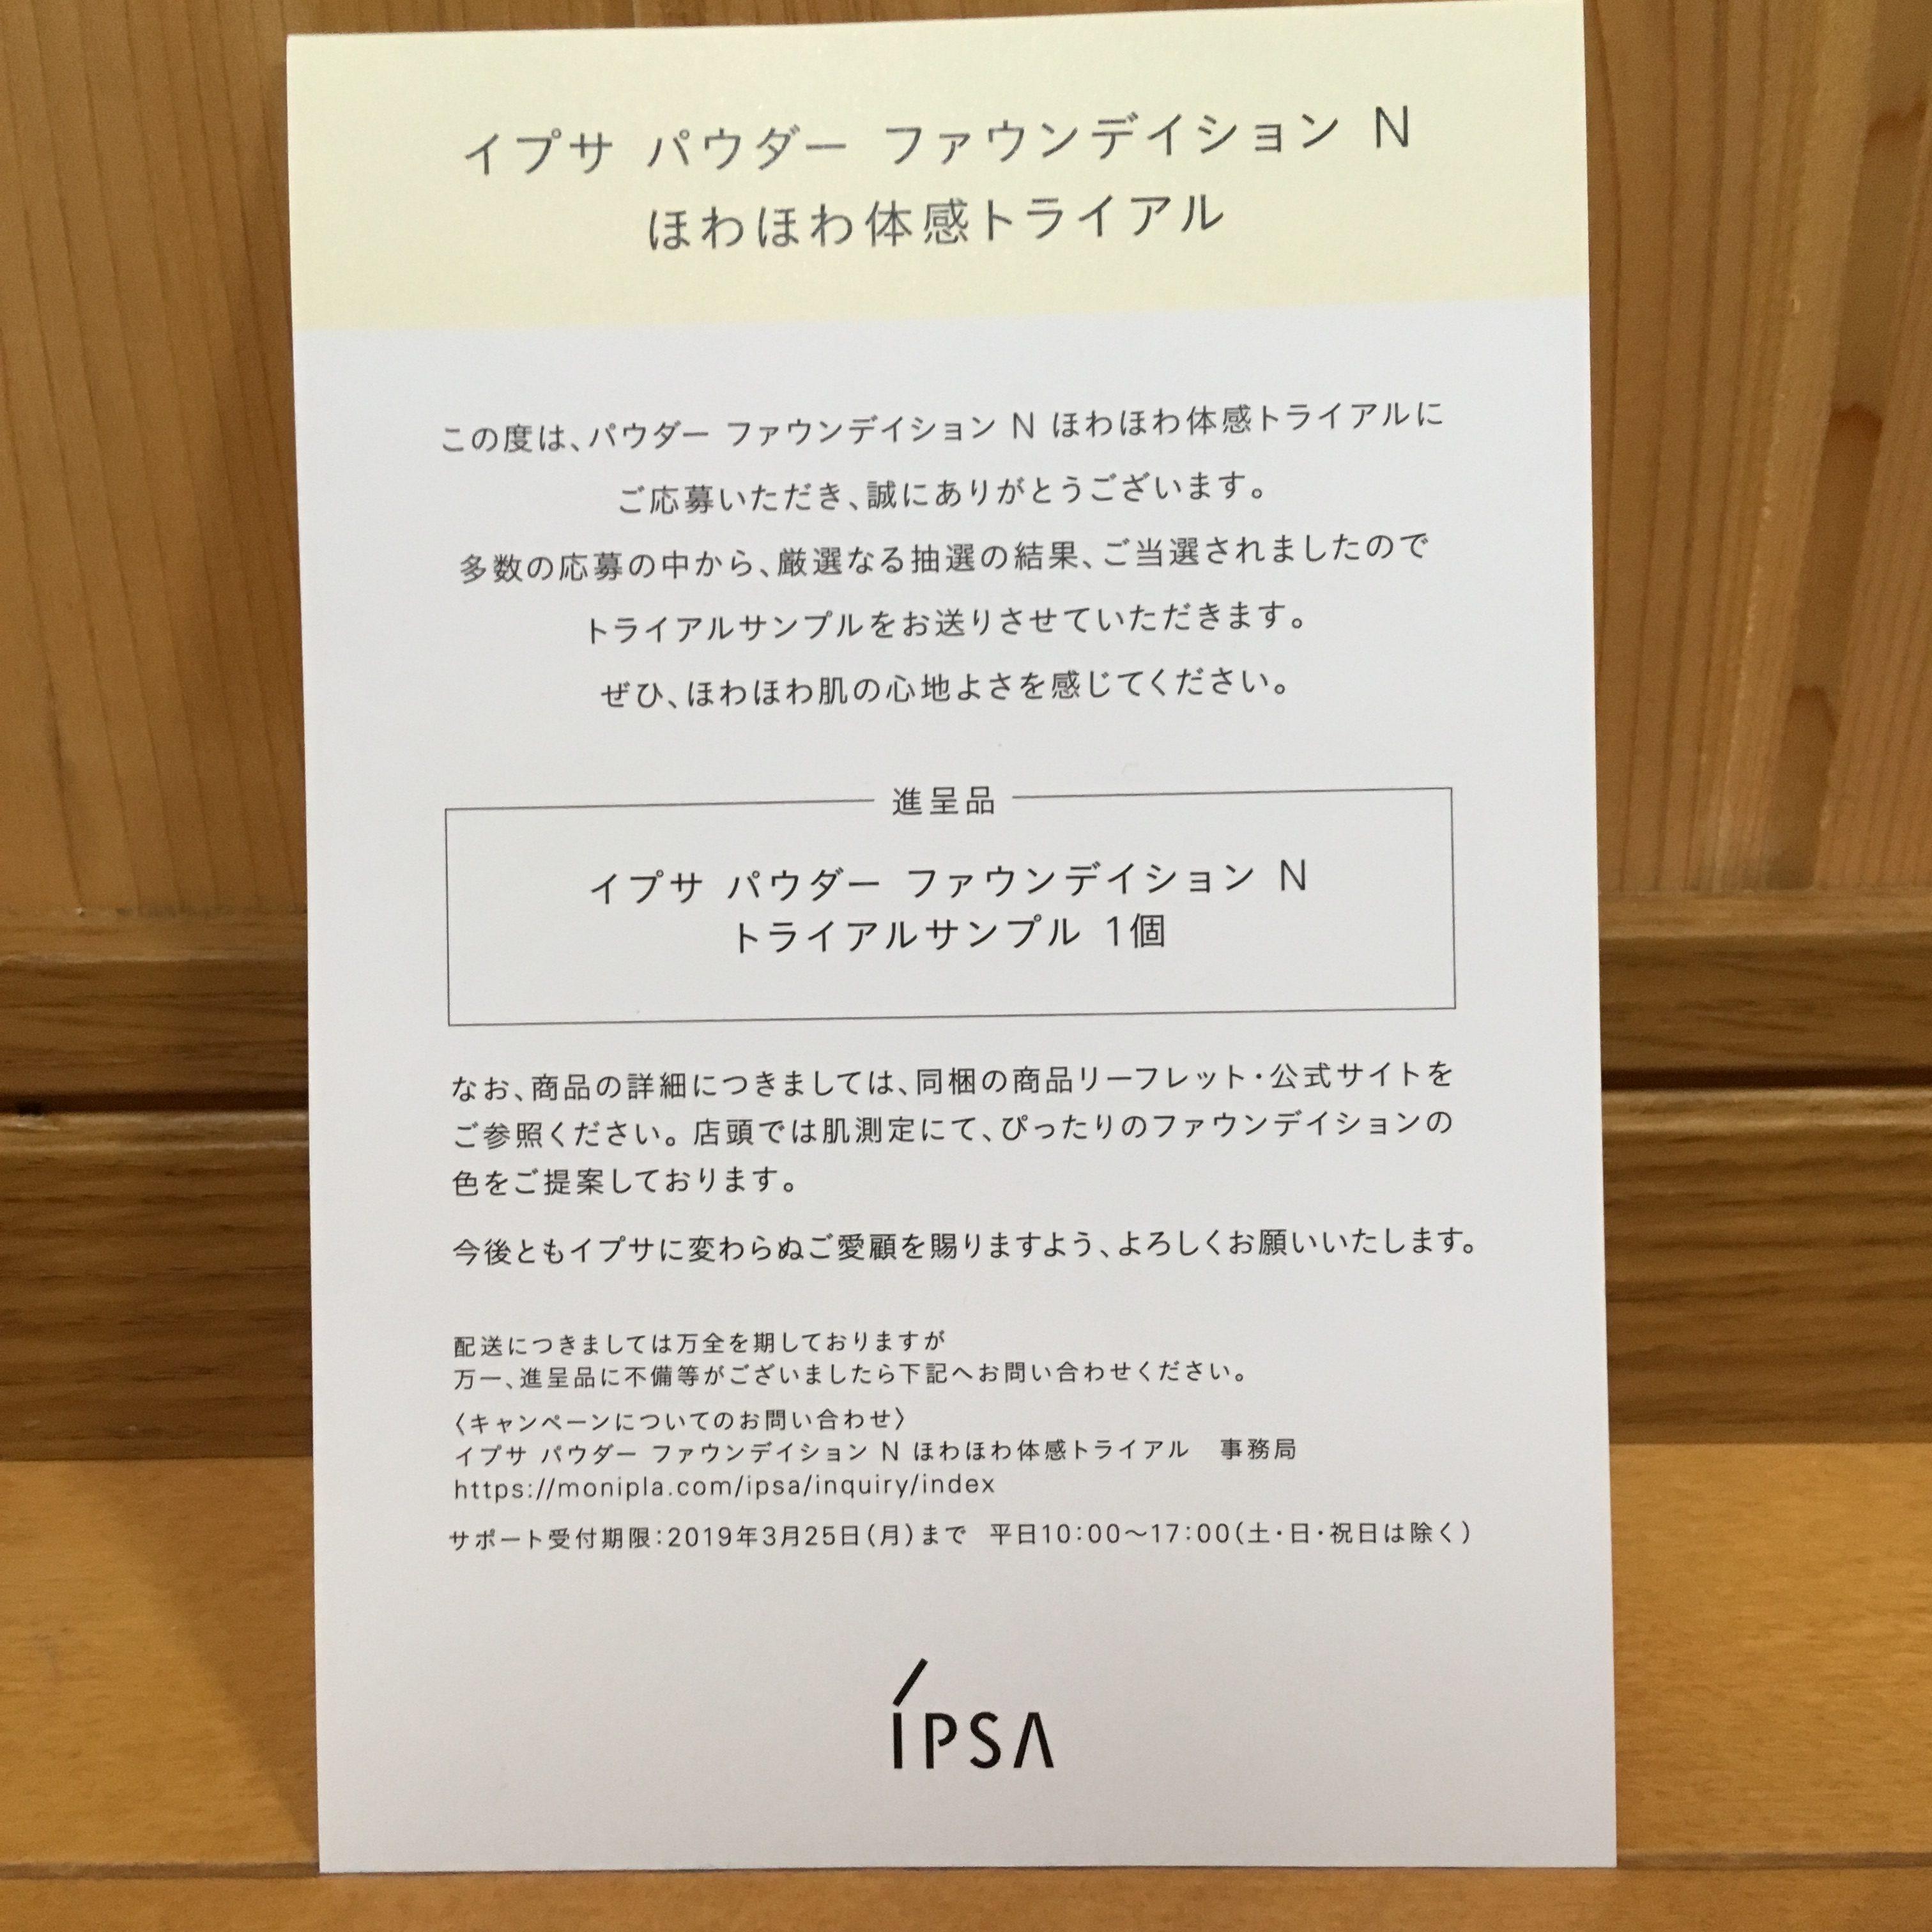 IPSA イプサ ほわほわ体感トライアル パウダーファウンデイションN